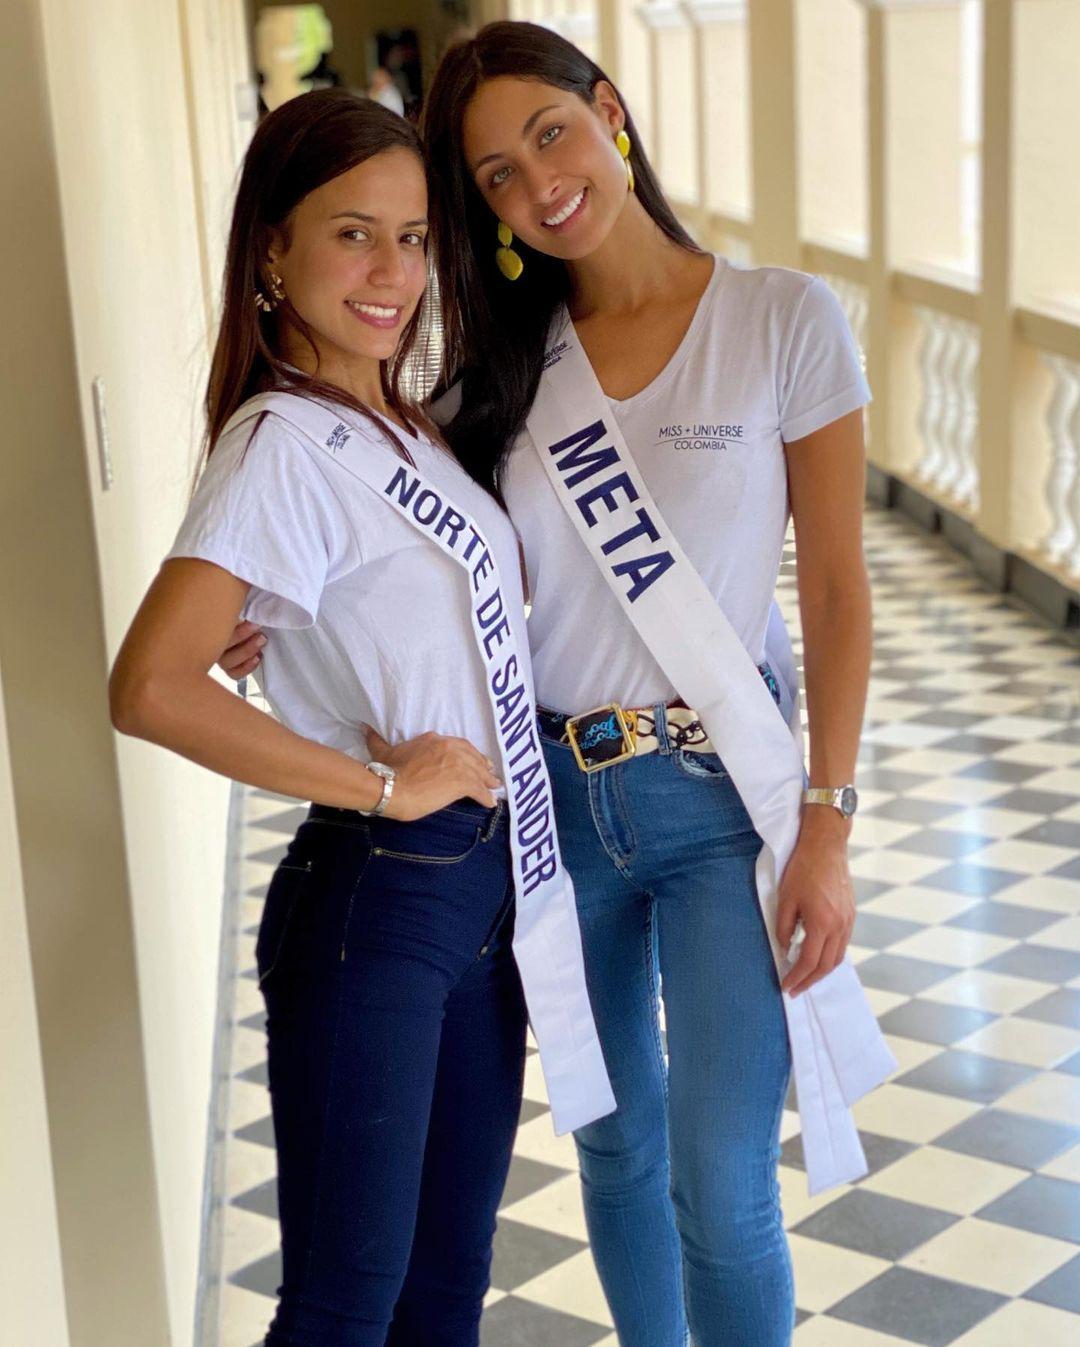 juliana franco, top 16 de miss colombia universo 2020/miss earth water 2017. - Página 21 Julifr27